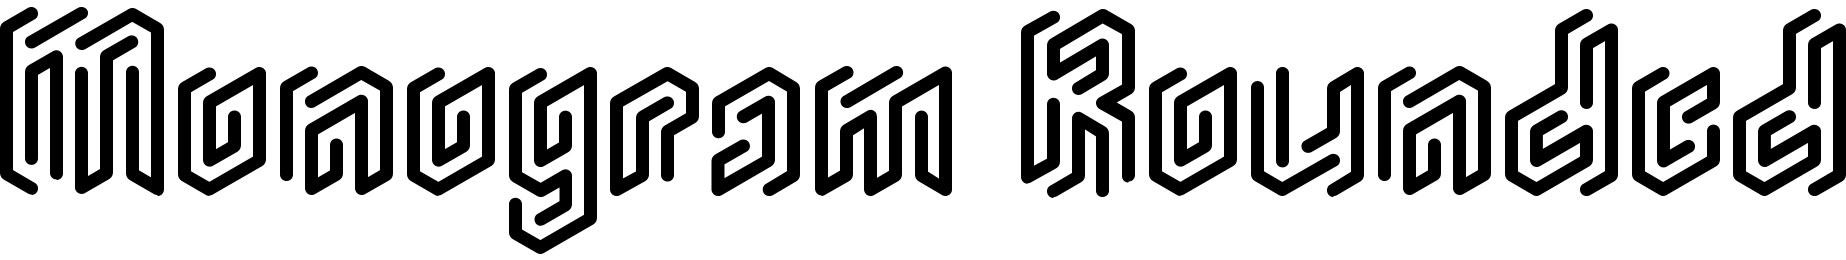 Monogram Rounded